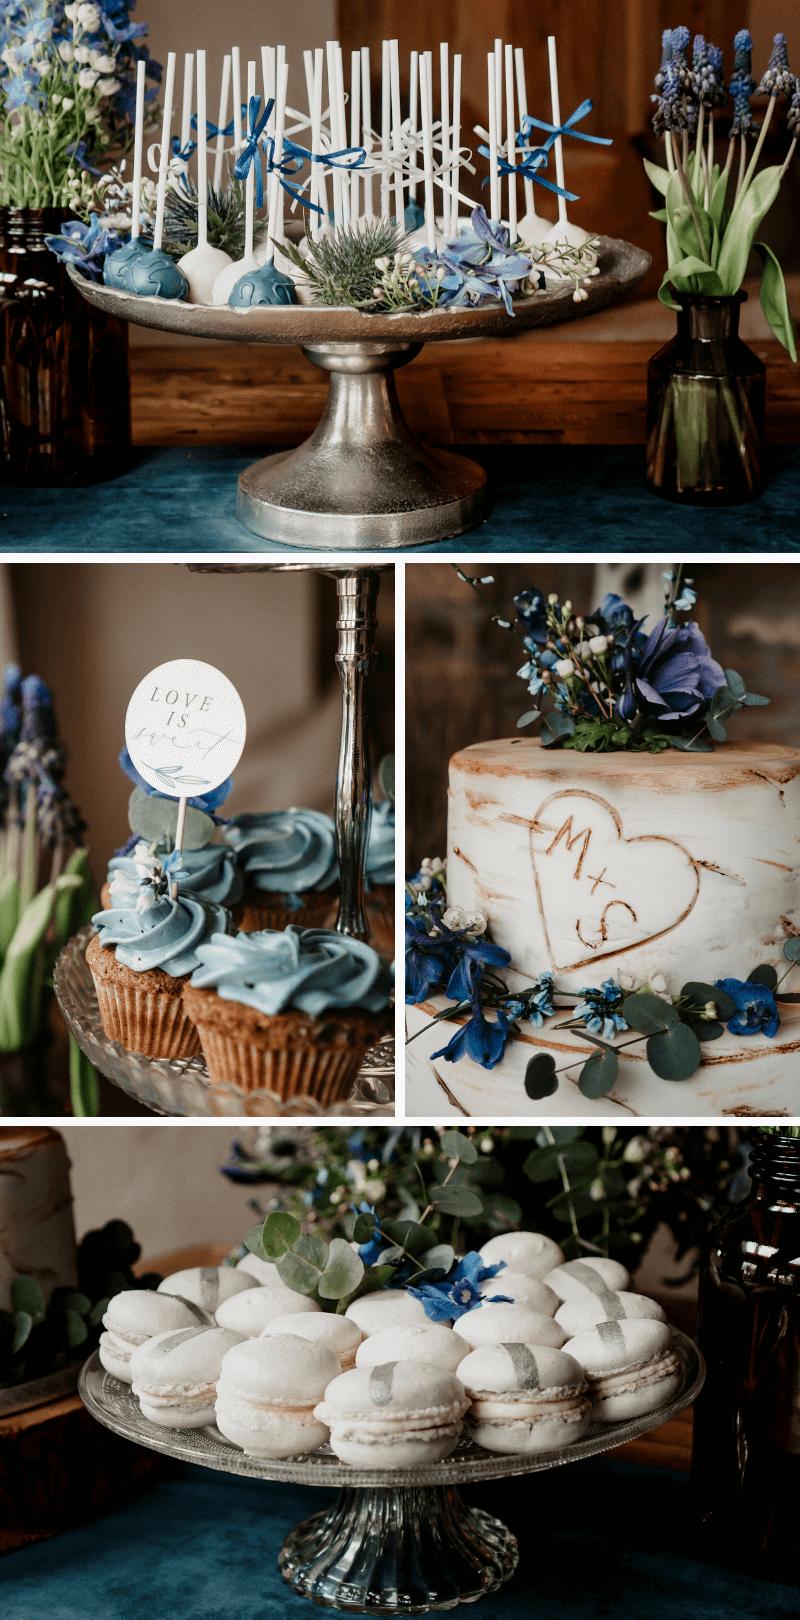 Hochzeit Sweet Table Blau